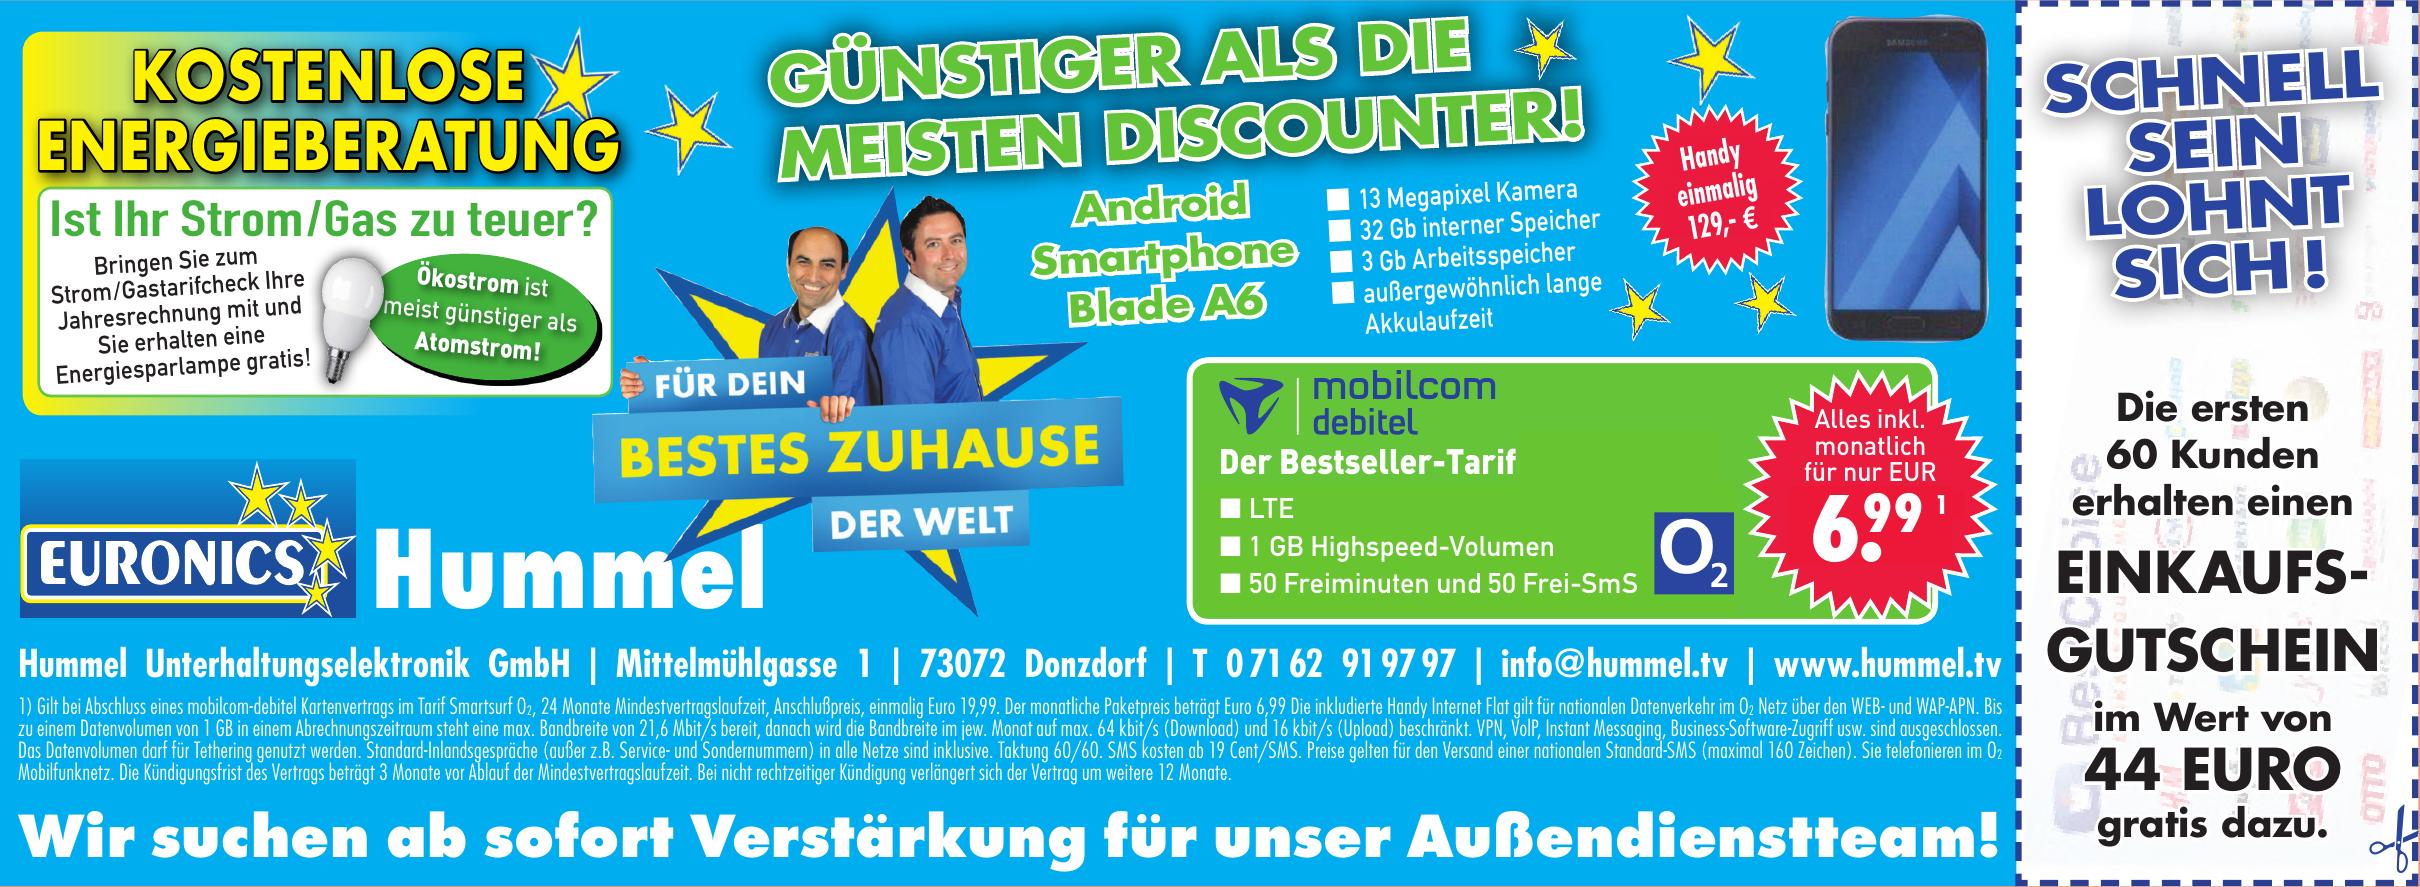 Hummel Unterhaltungselektronik GmbH